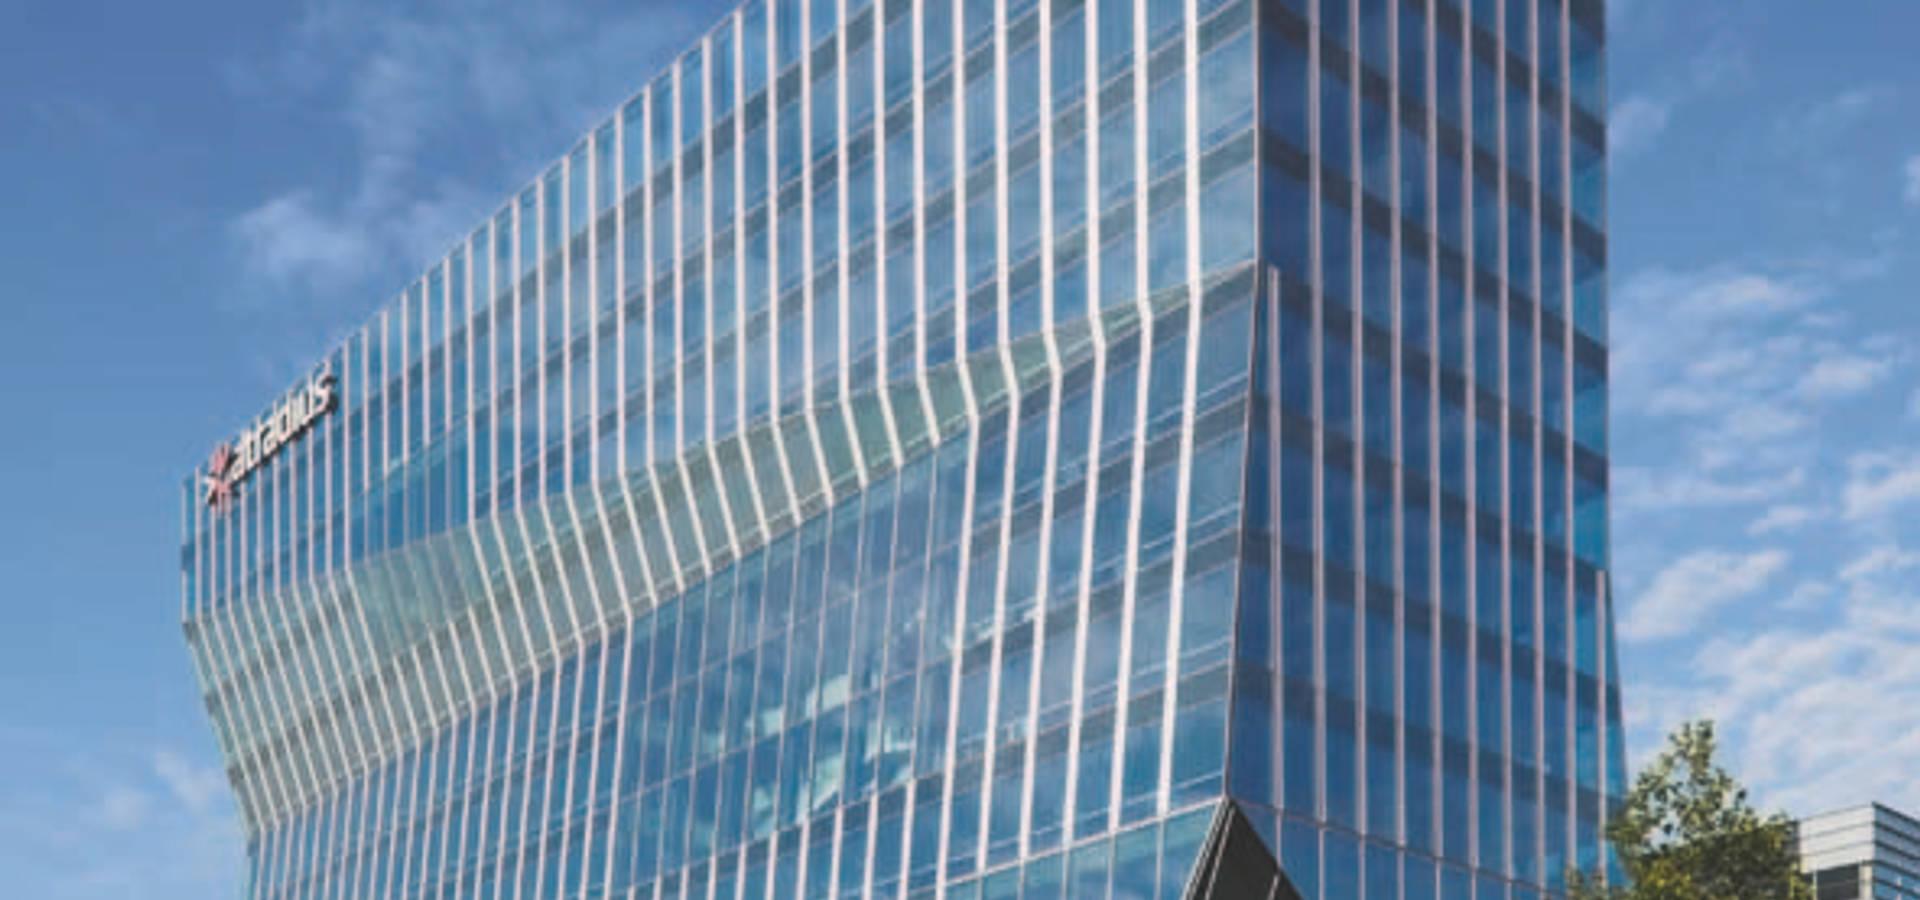 OeverZaaijer architectuur en stedebouw